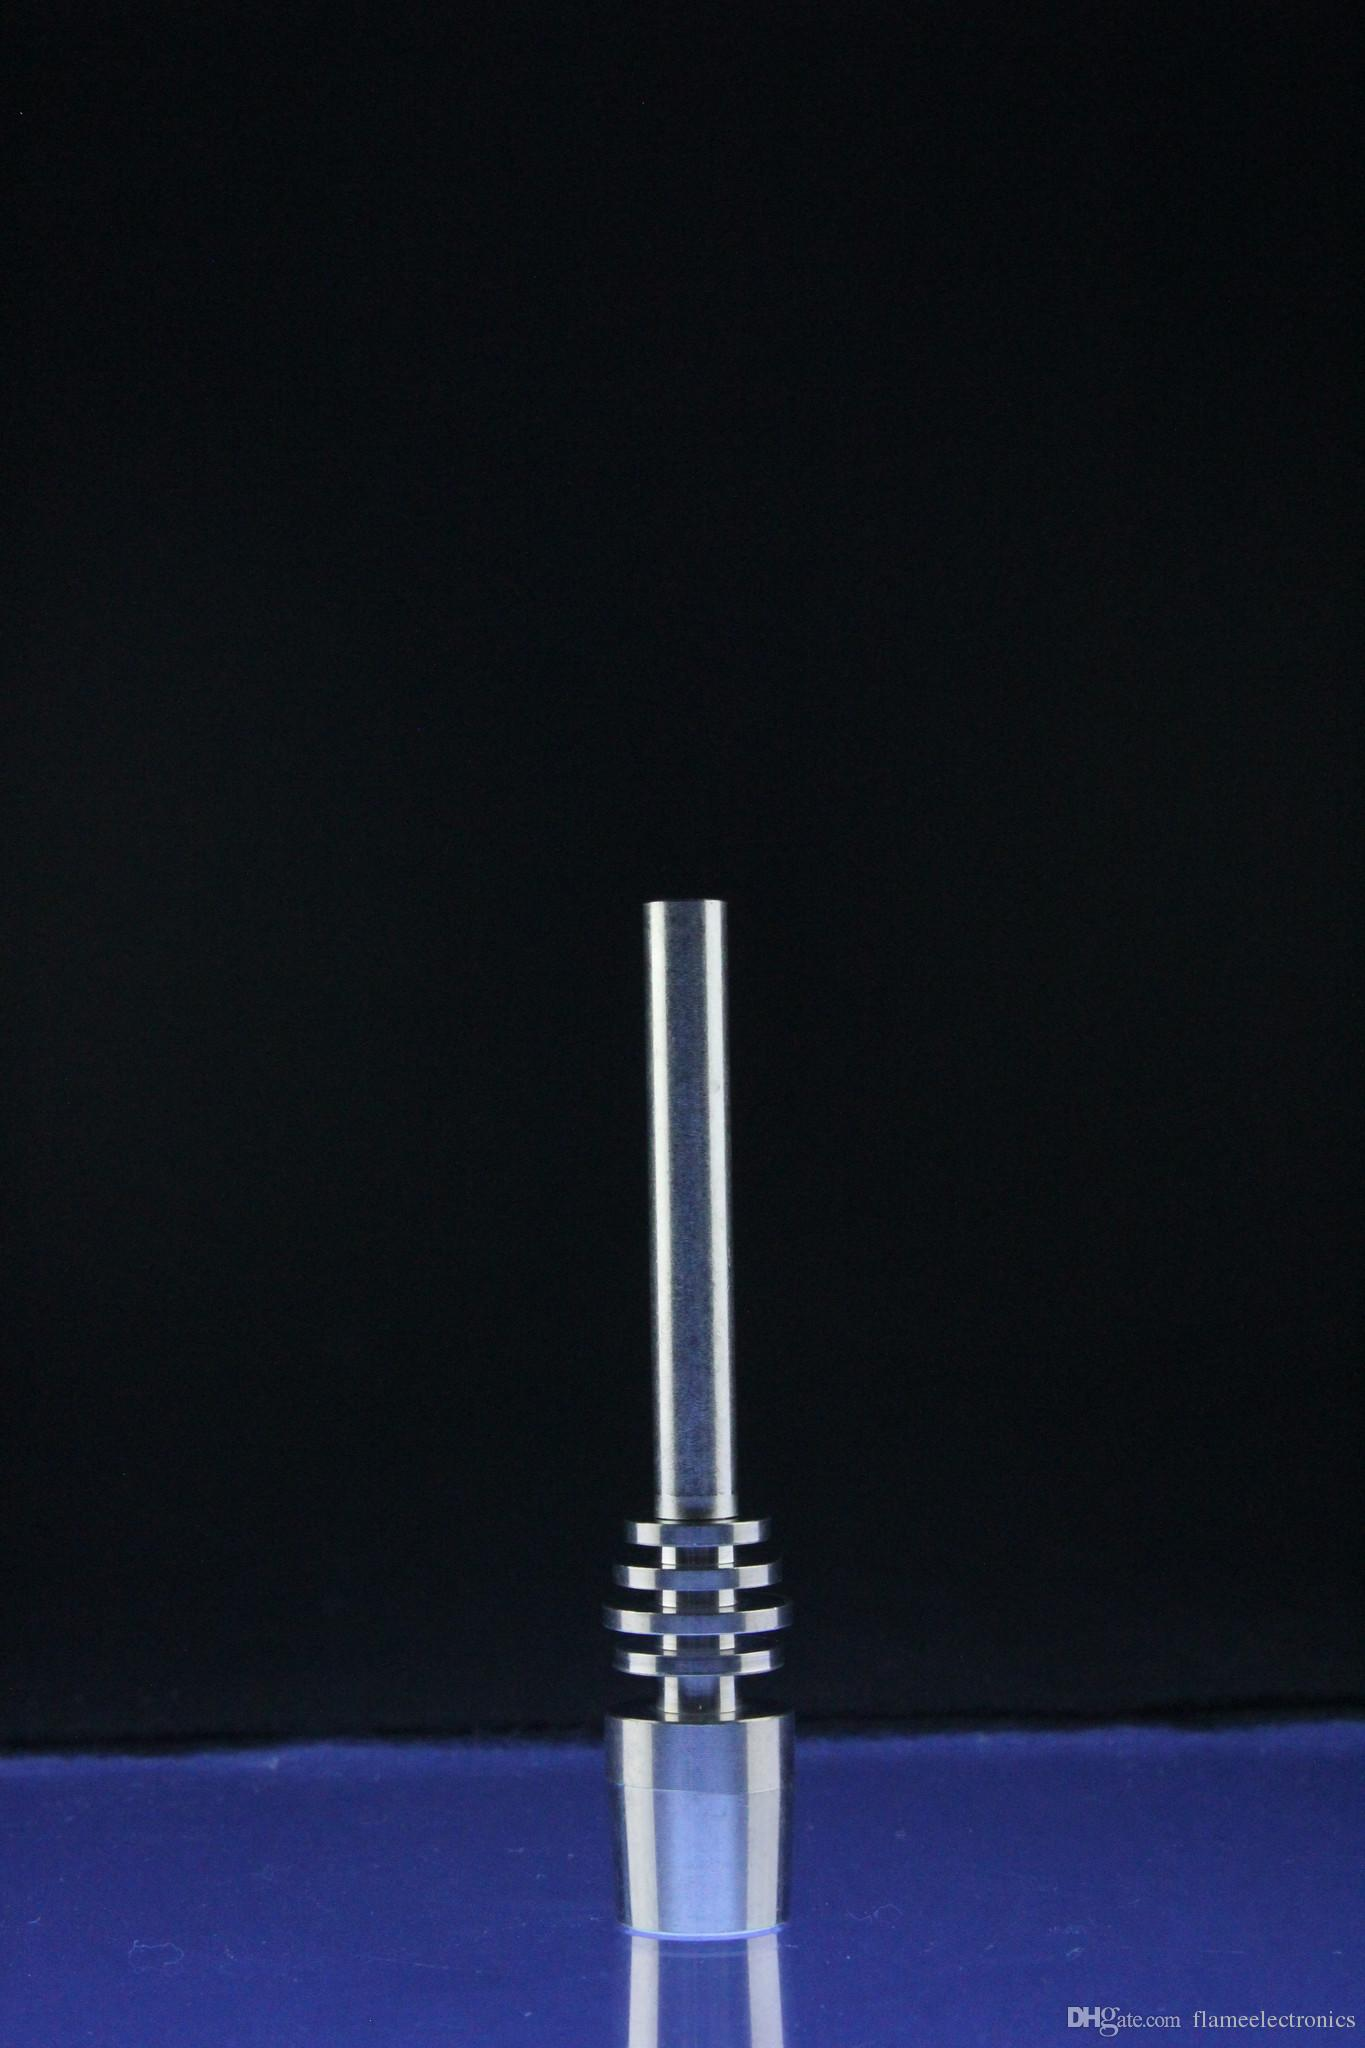 Super Titanium Nectar Collector Tip Titanium Nail 10mm 14mm 18mm Inverted Nail Grade 2 Titanium Tip Ti Nail For Nectar Collector Glass